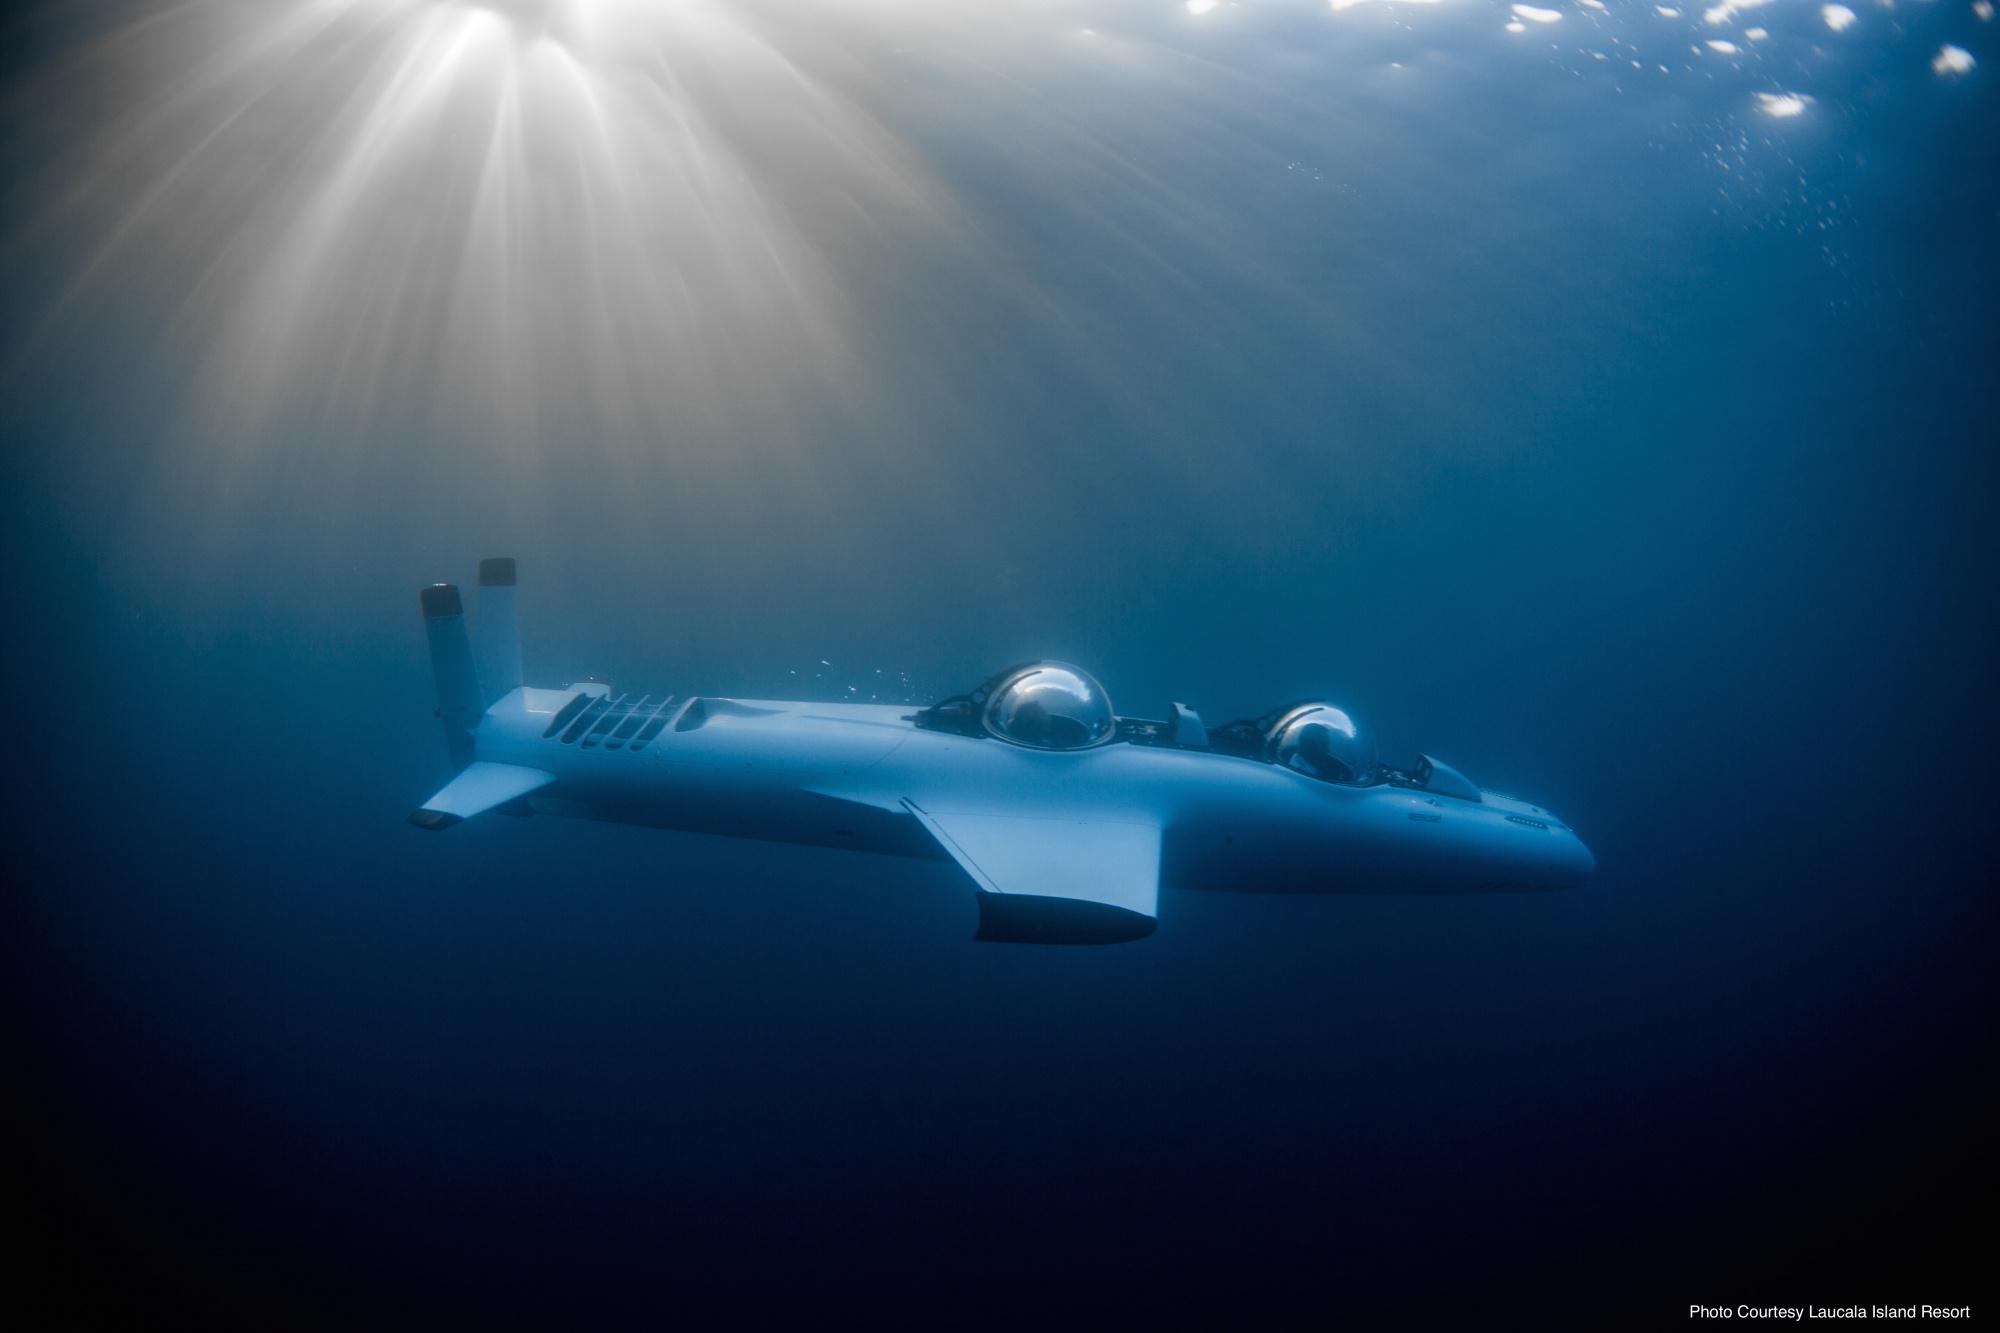 Laucala-Island-DeepFlight-Submarine-15.jpg